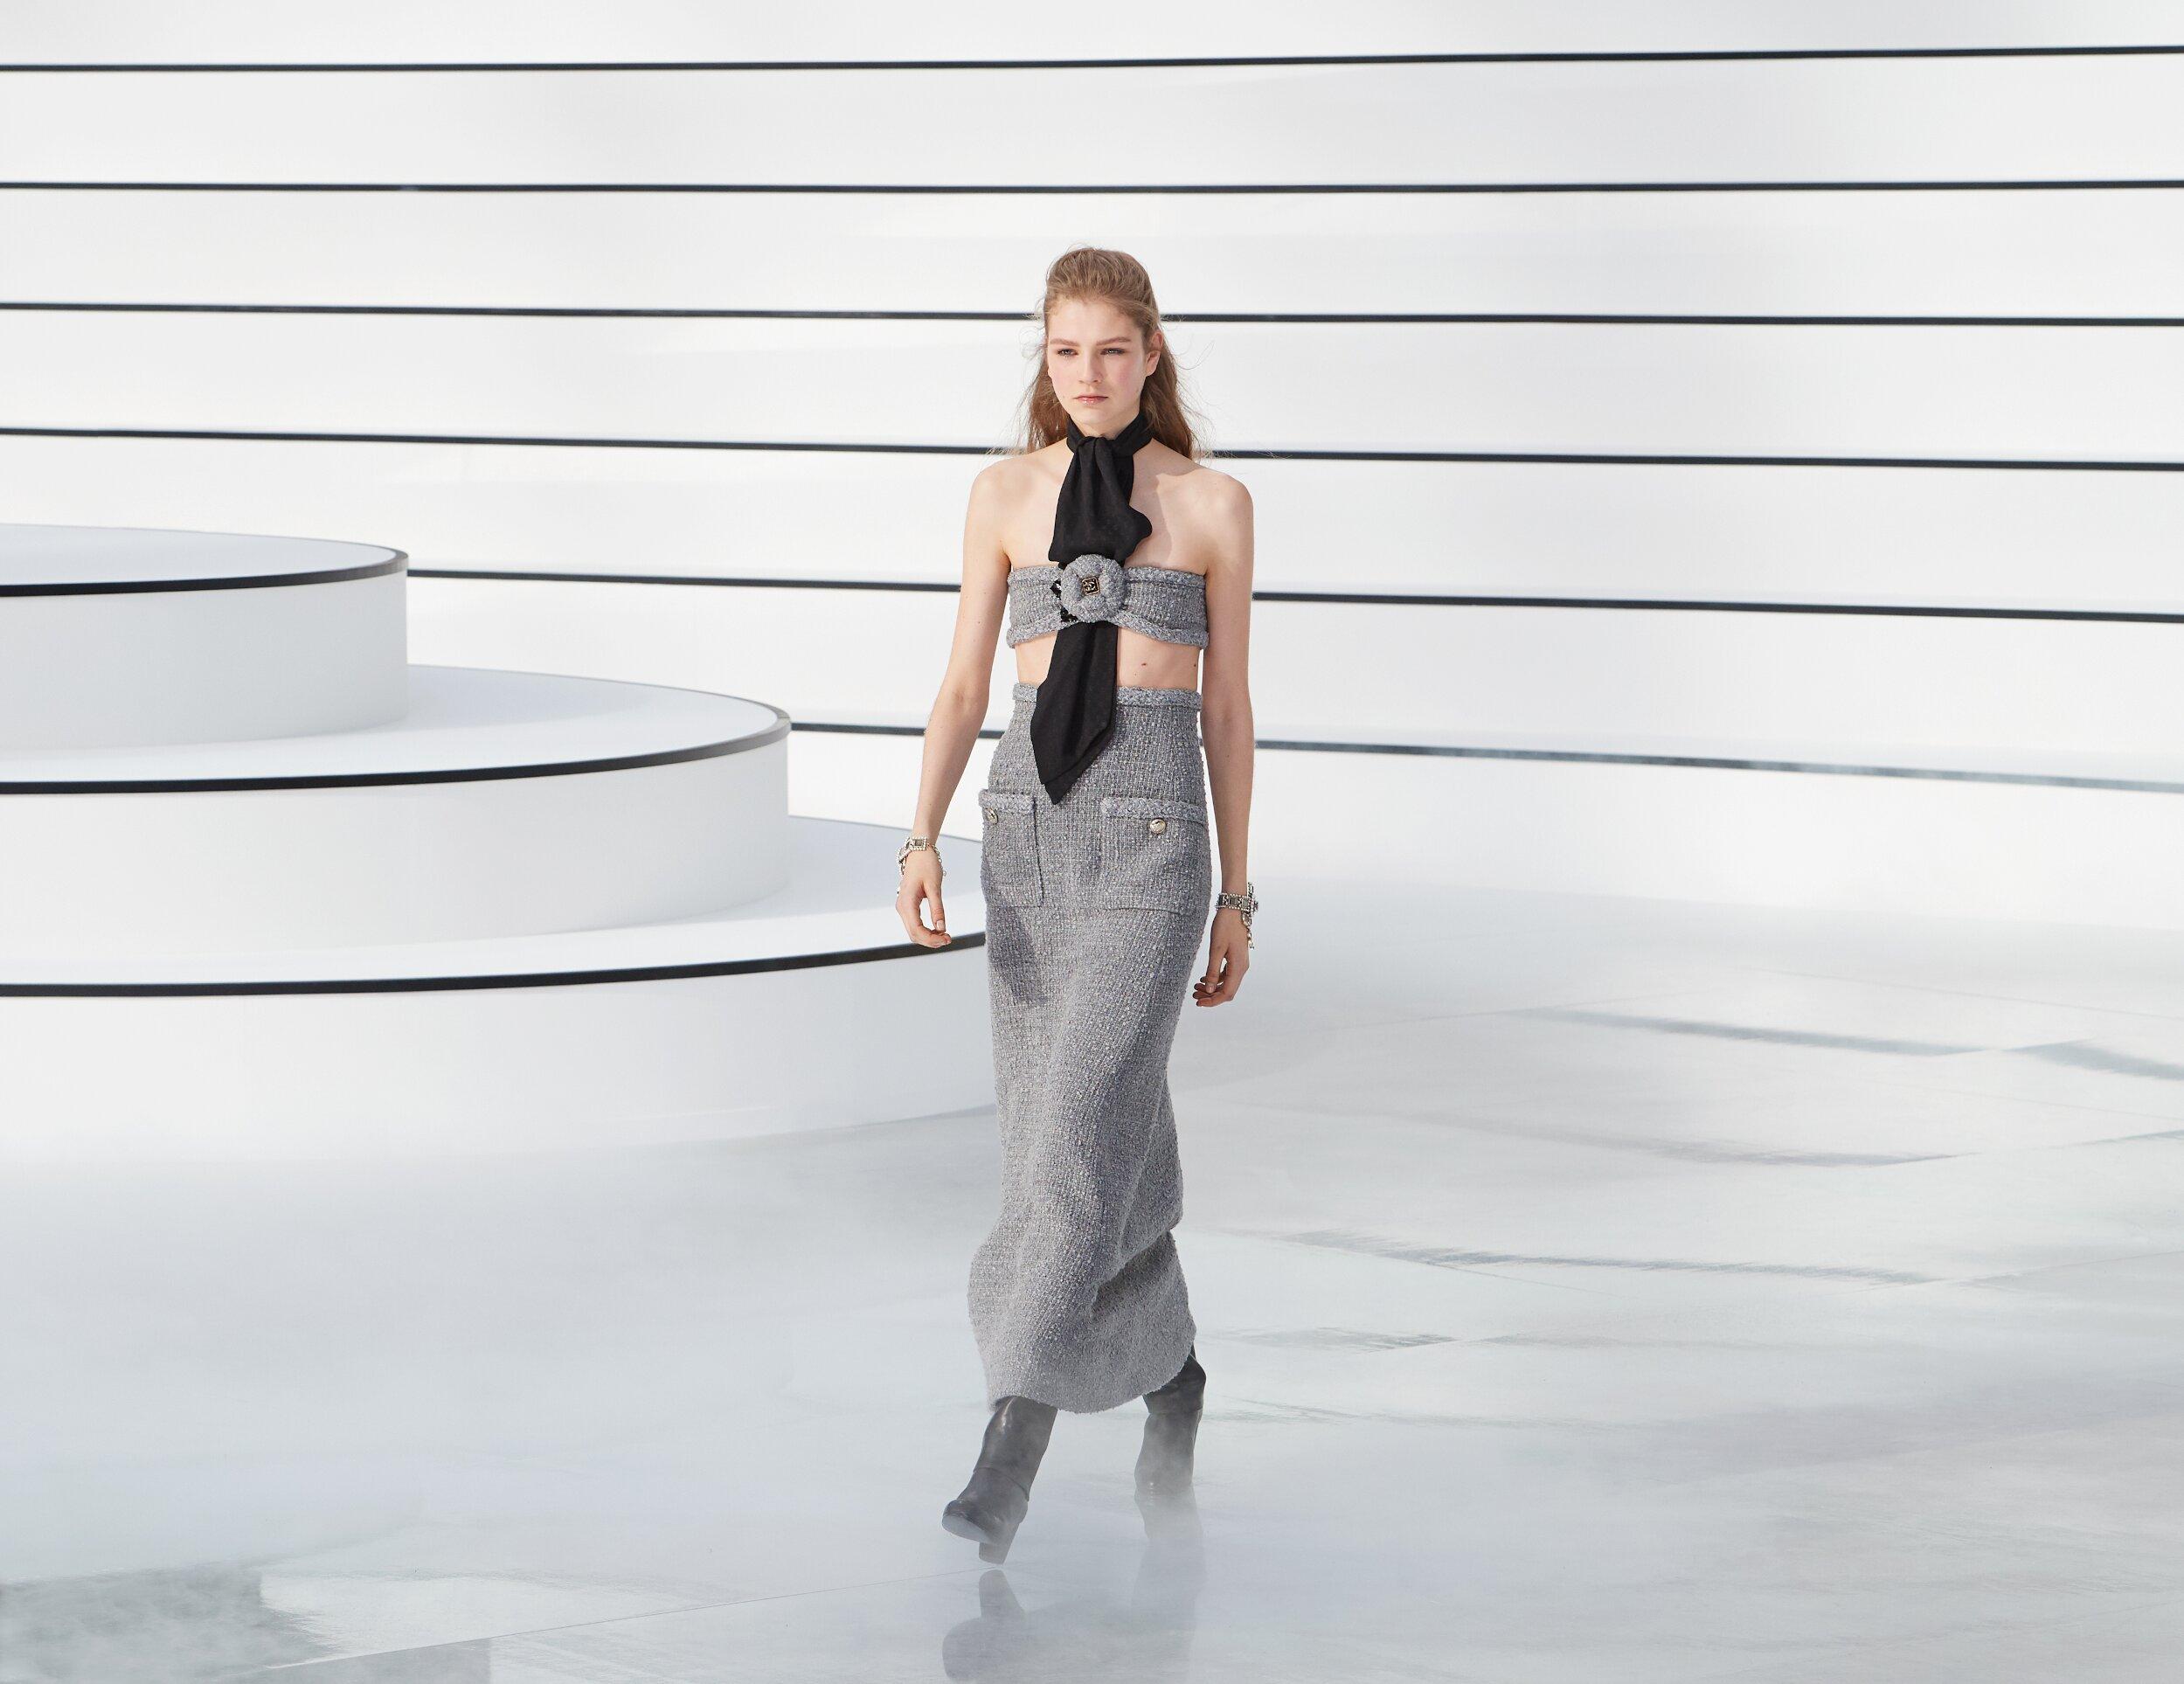 Catwalk Chanel Winter 2020